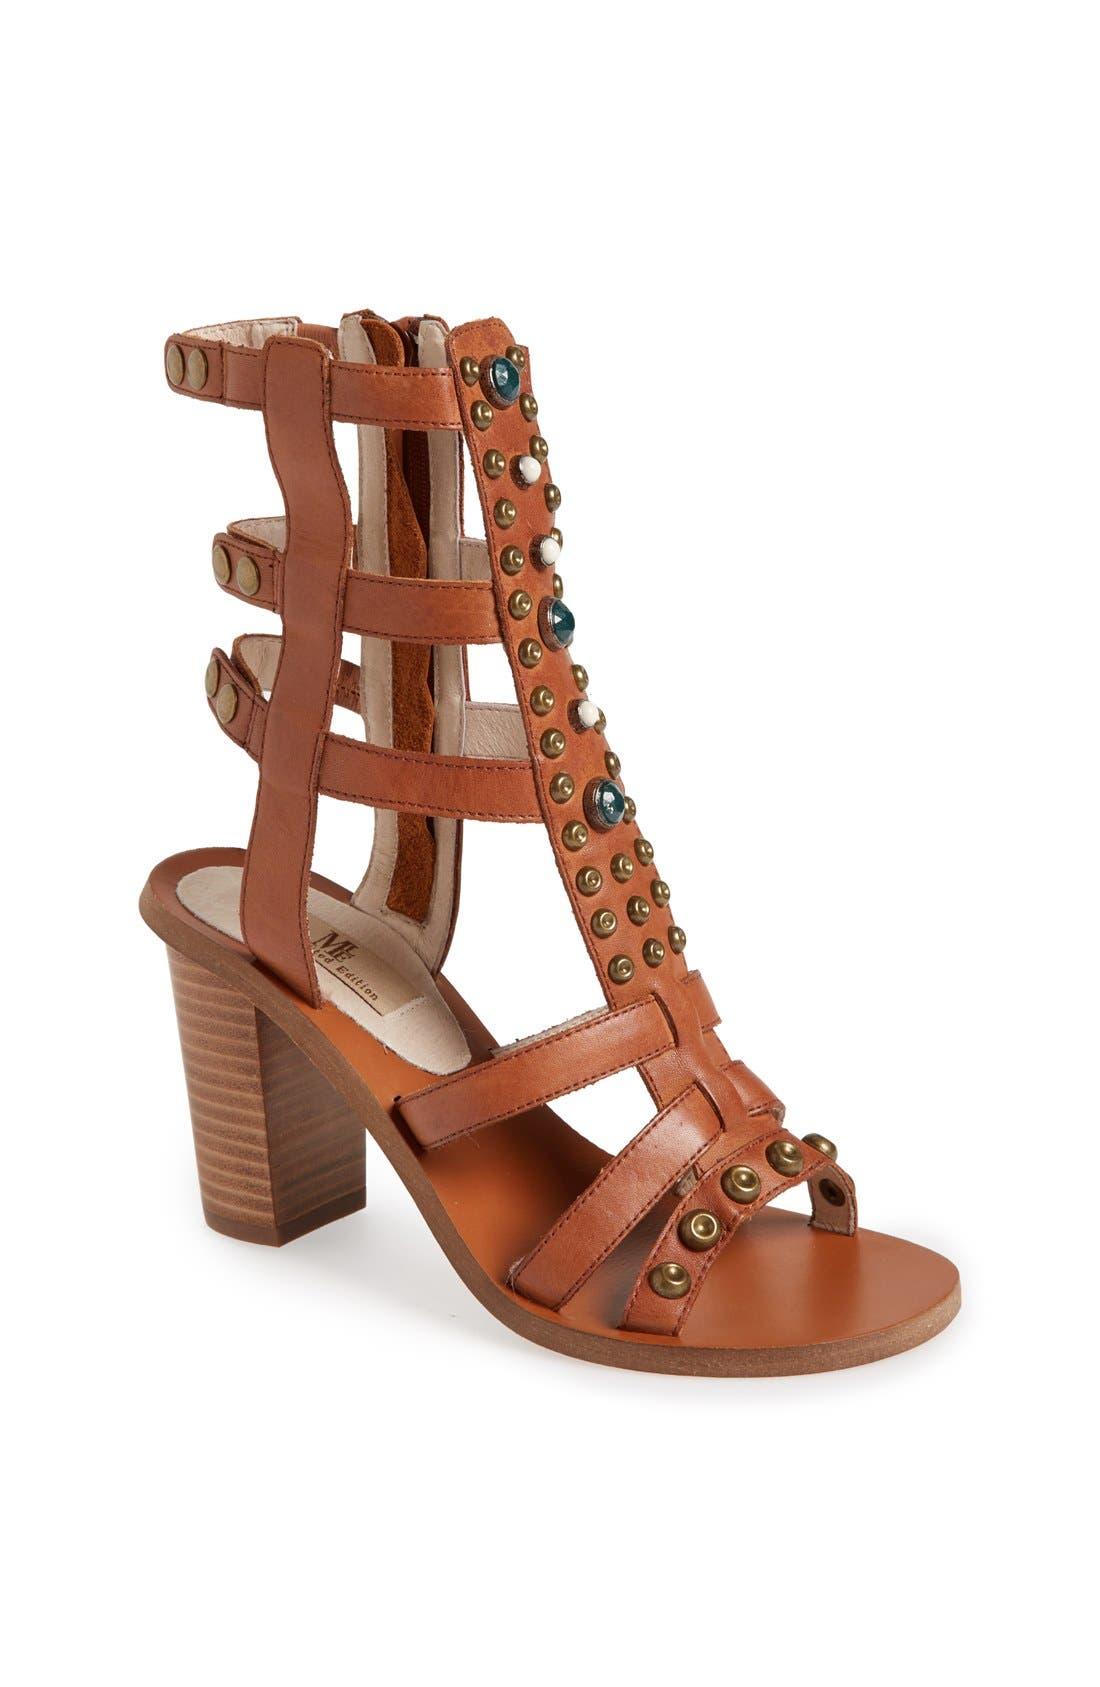 Main Image - MIA Limited Edition 'Sphinx' Sandal